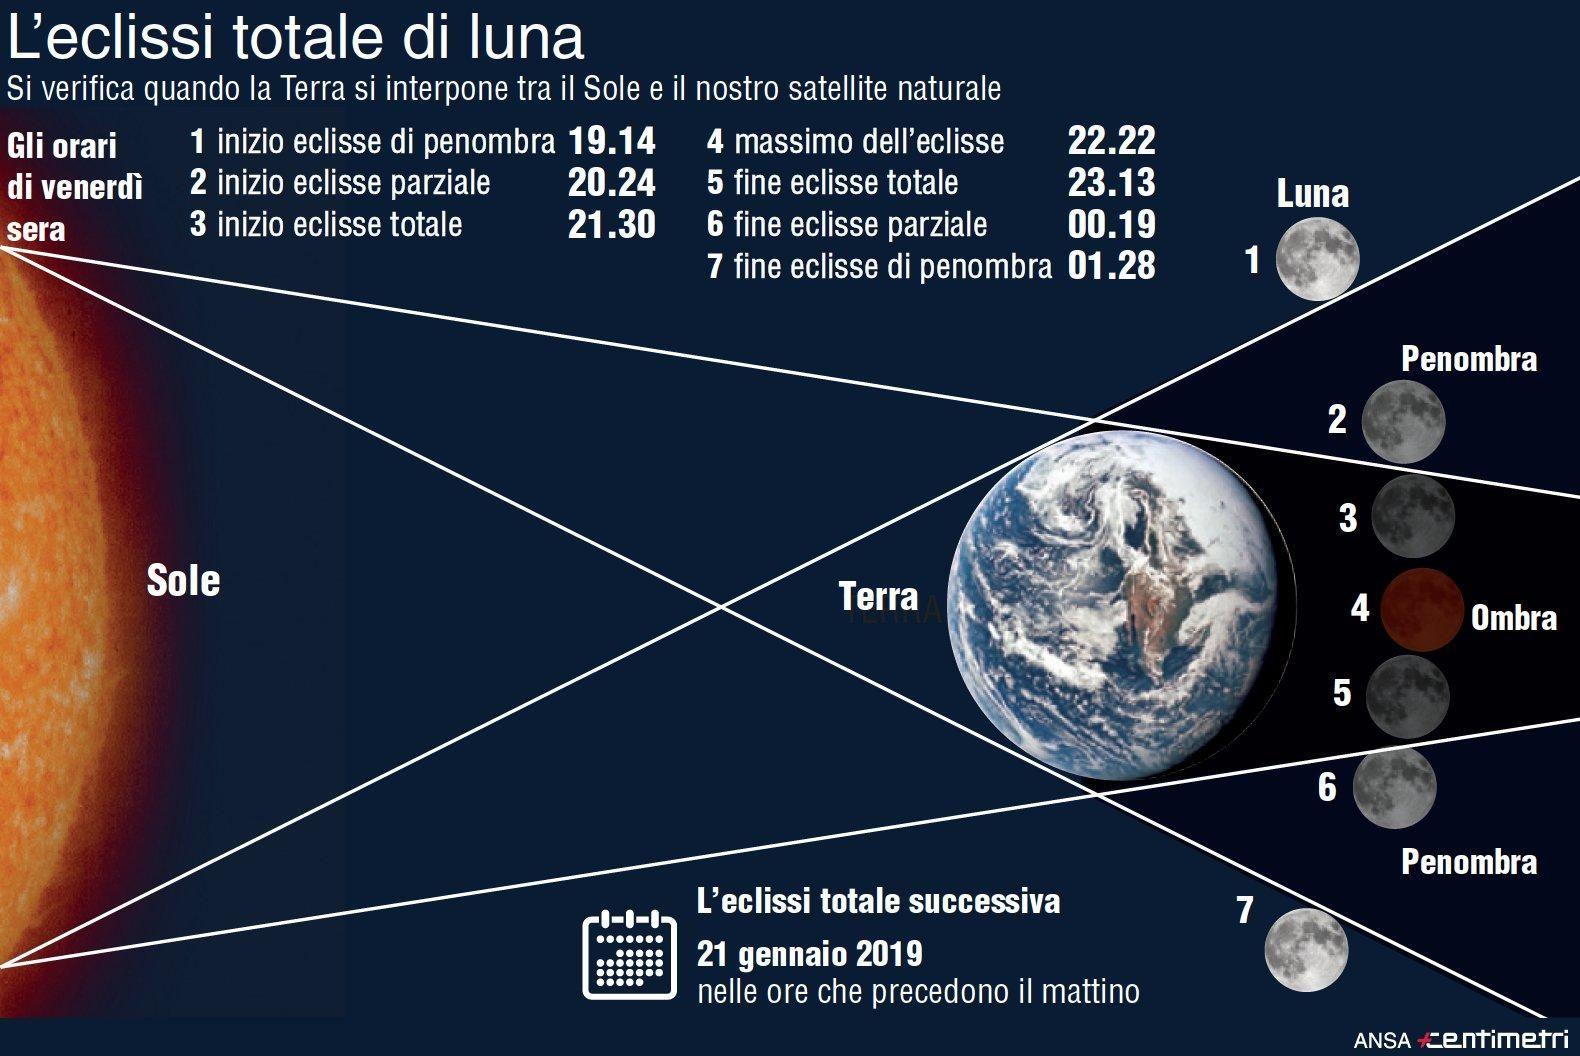 27 luglio 2018, arriva l'eclissi totale più lunga del secolo : Durerà 103 minuti, luna rossa, stasera